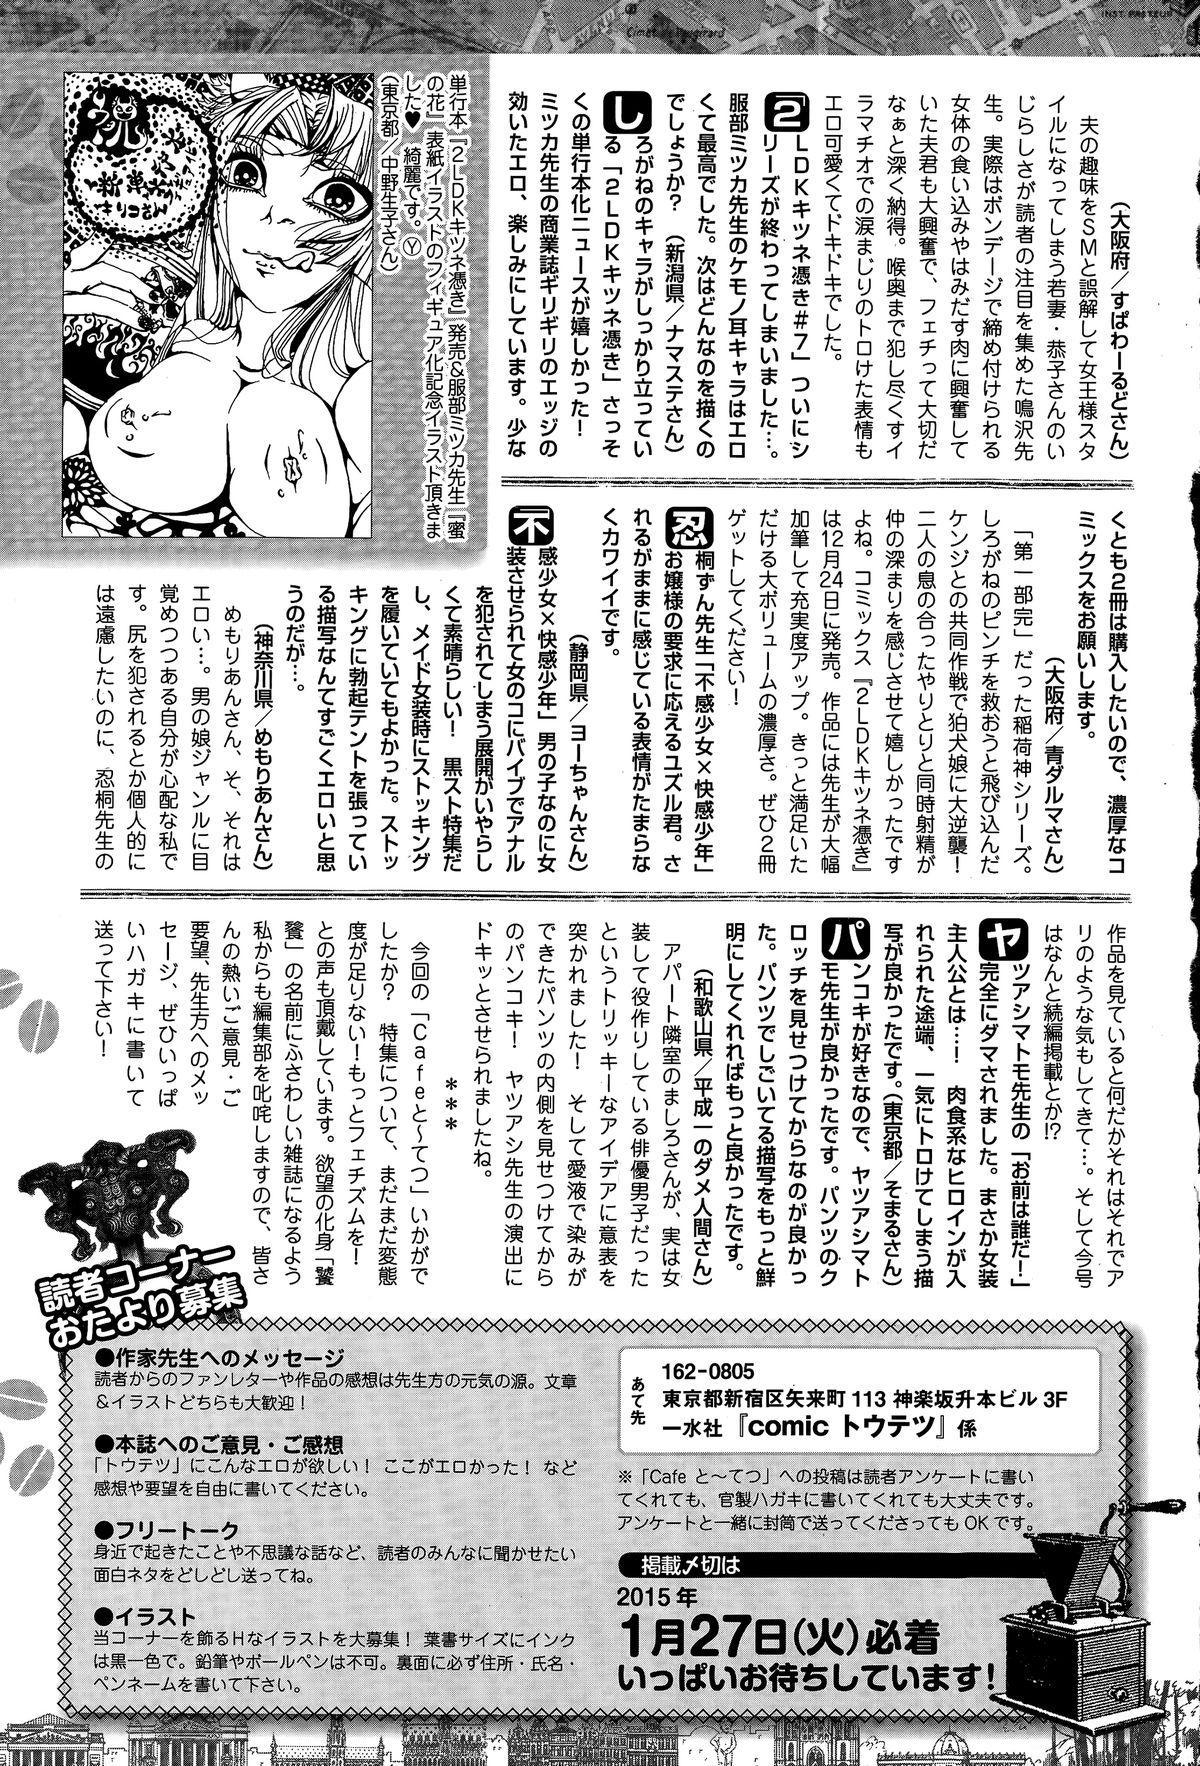 Comic Toutetsu 2015-02 Vol. 3 242